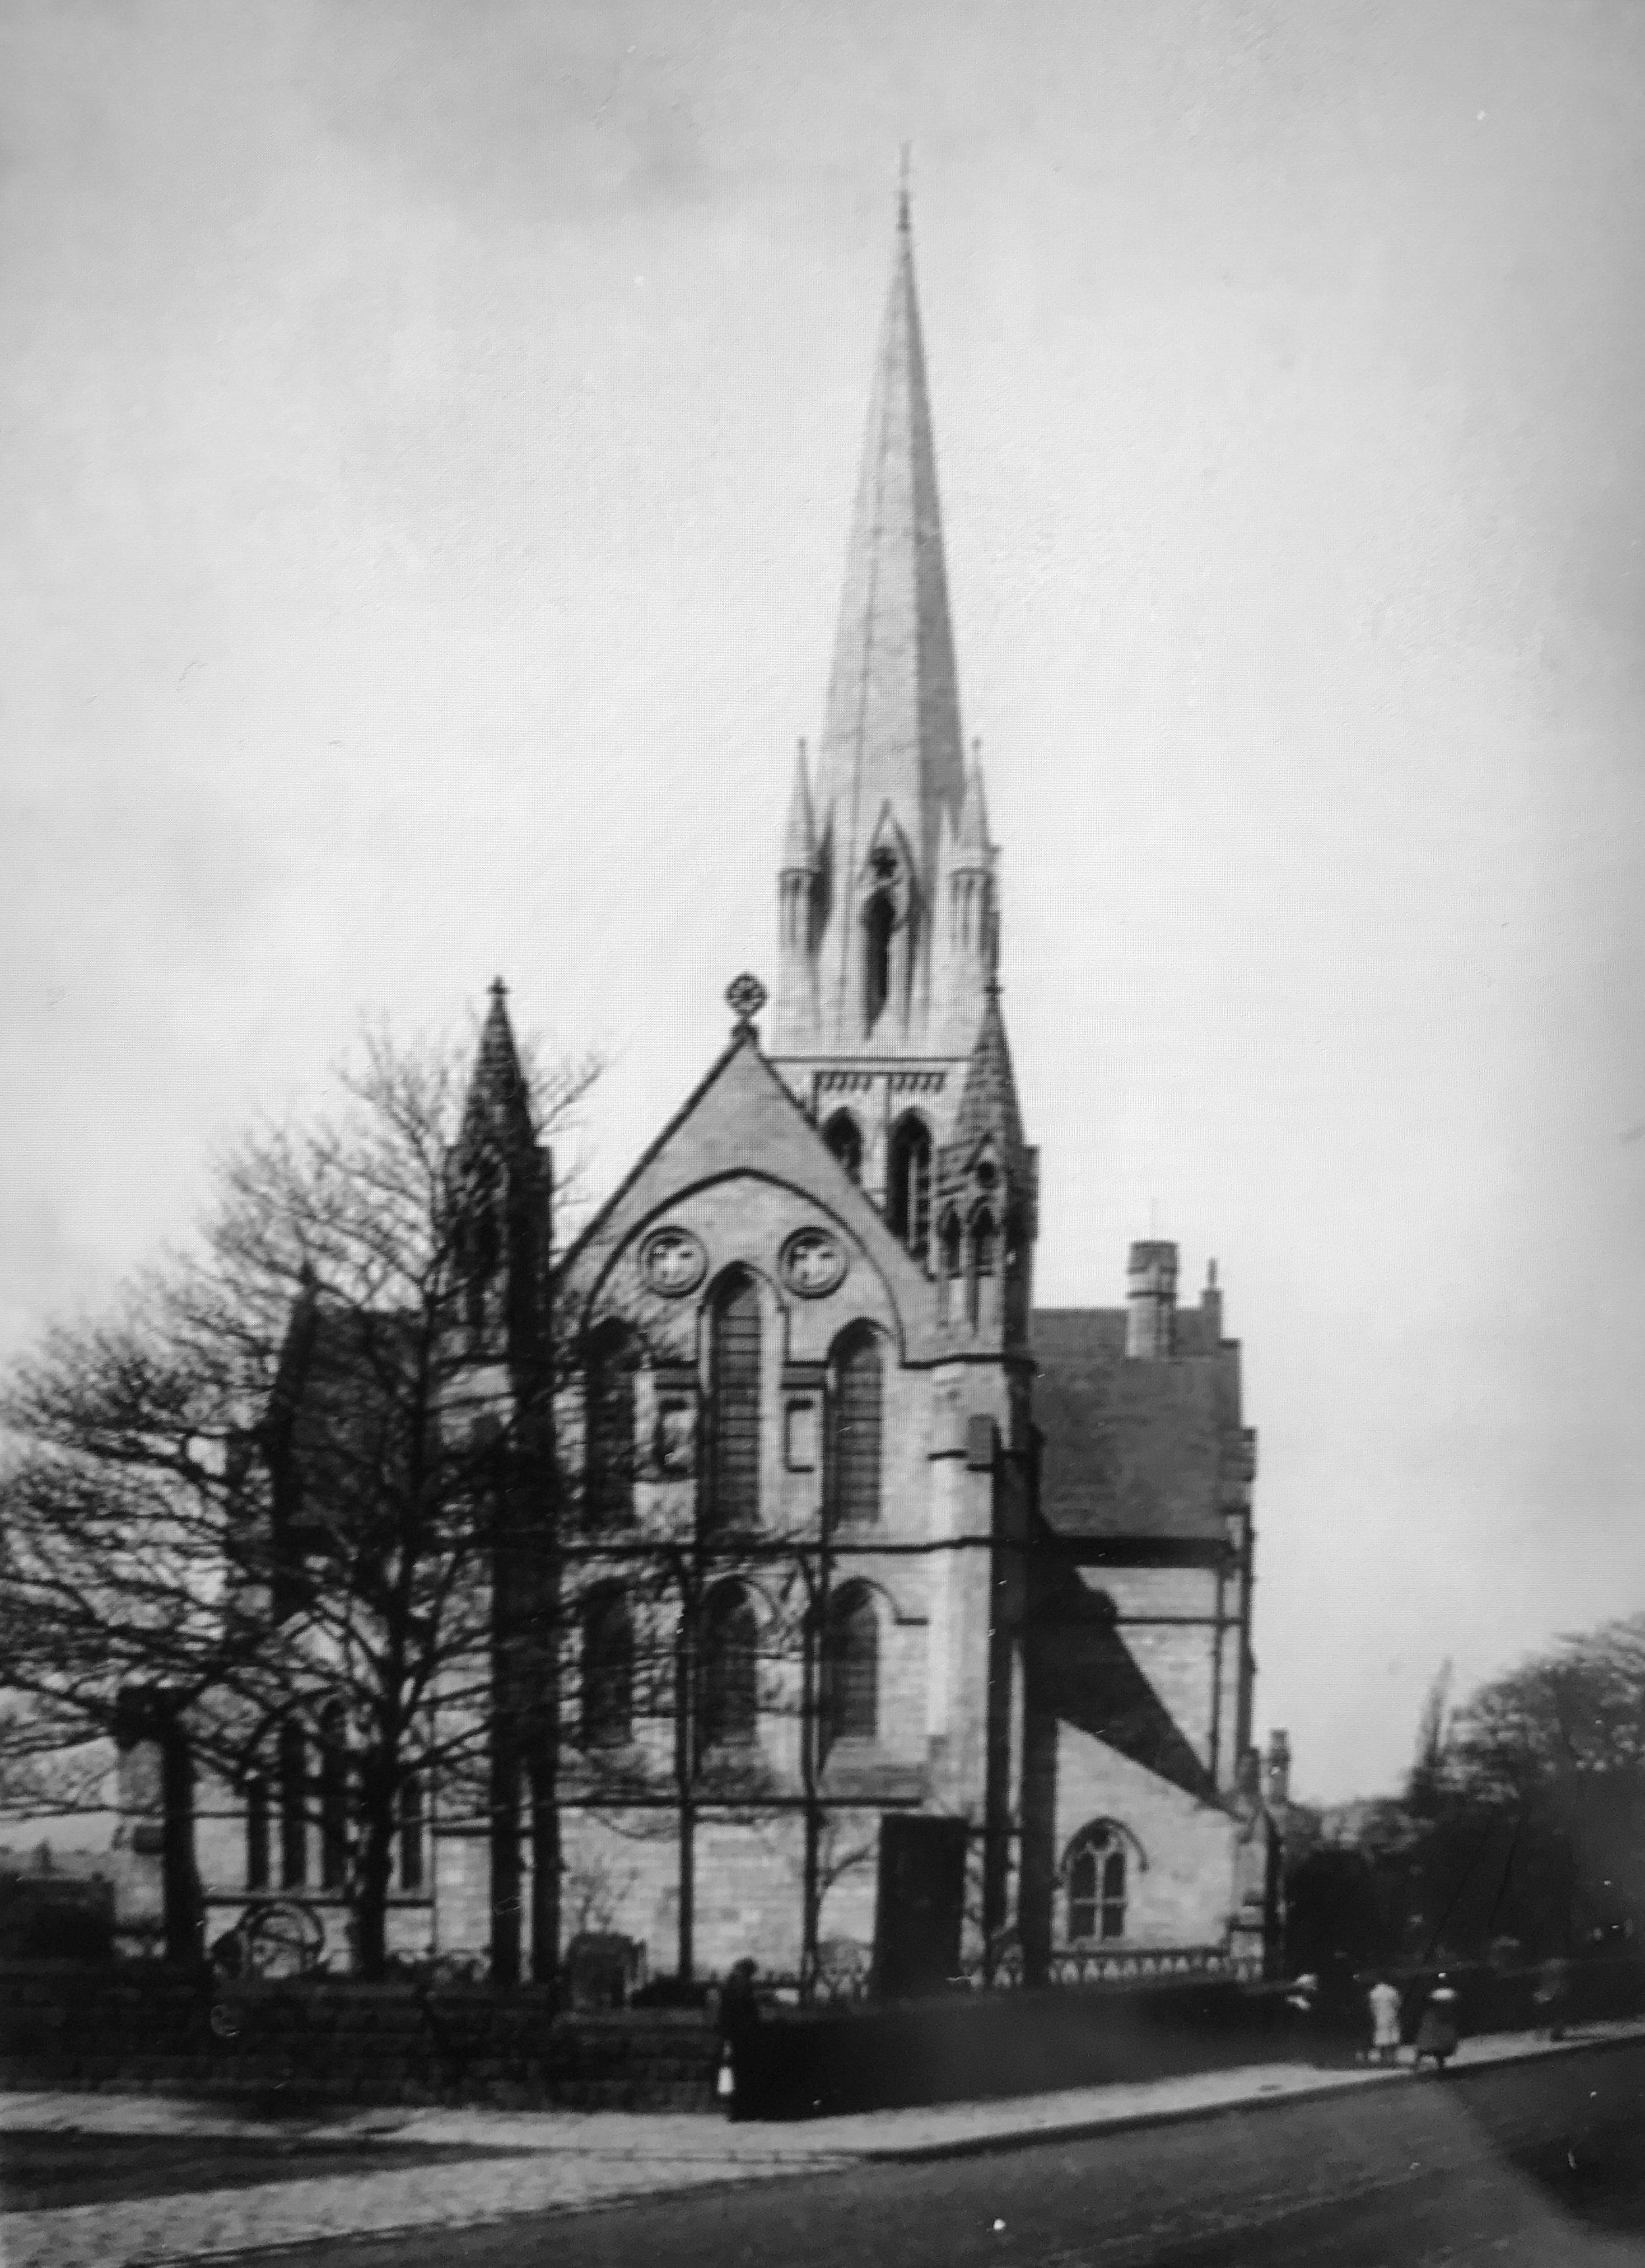 St Michael's Church, 1890